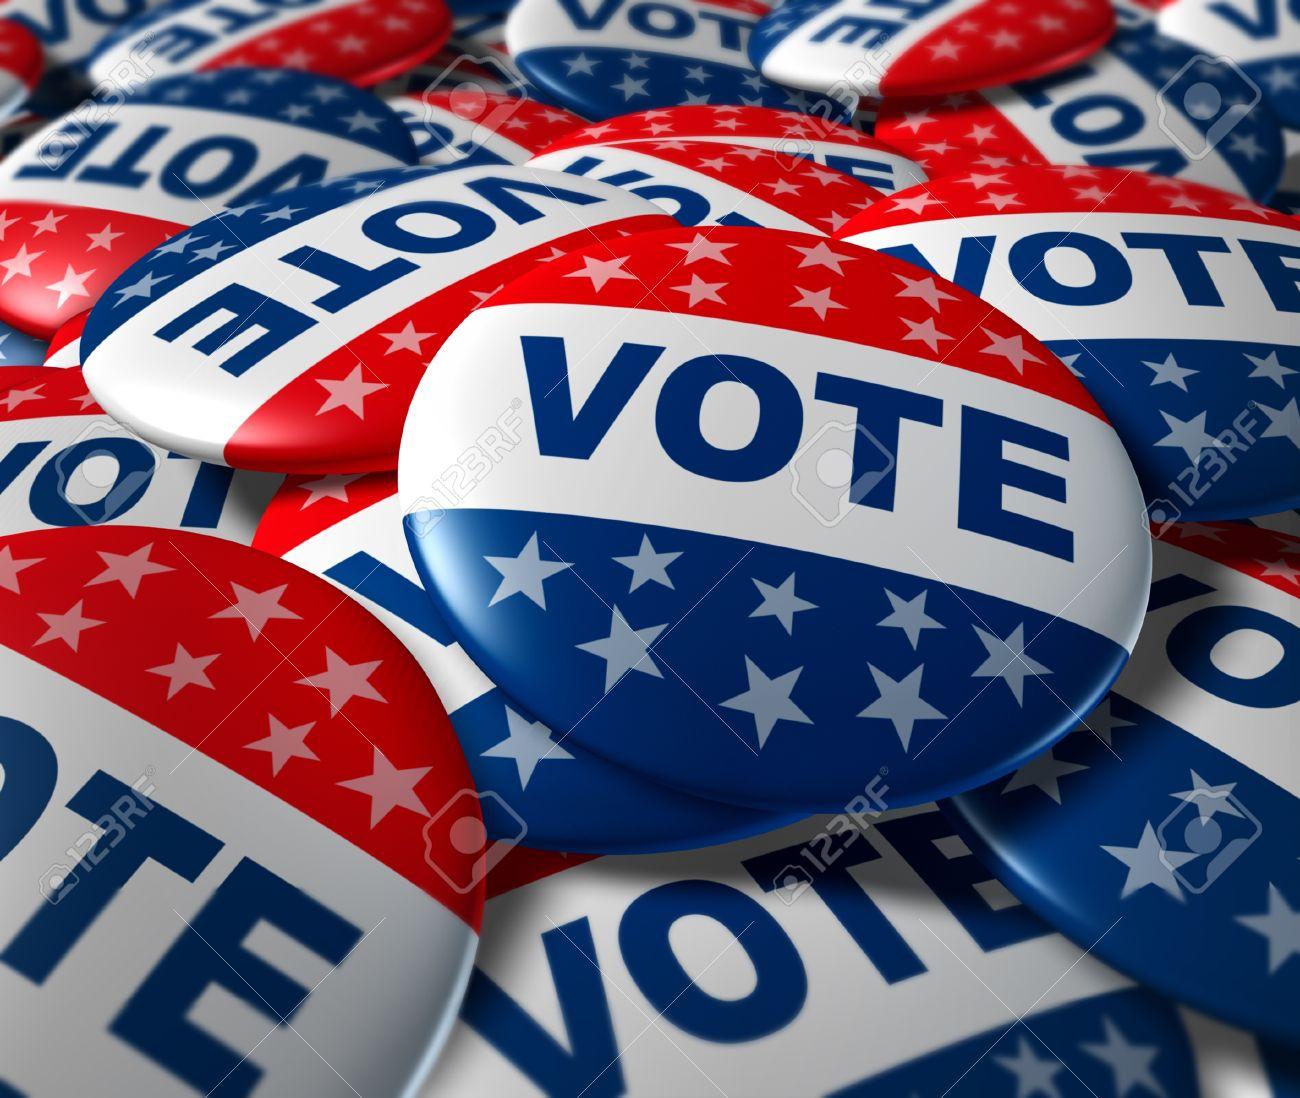 Vote badges patriotic button patriotic button badge election politics symbol Stock Photo - 11495653